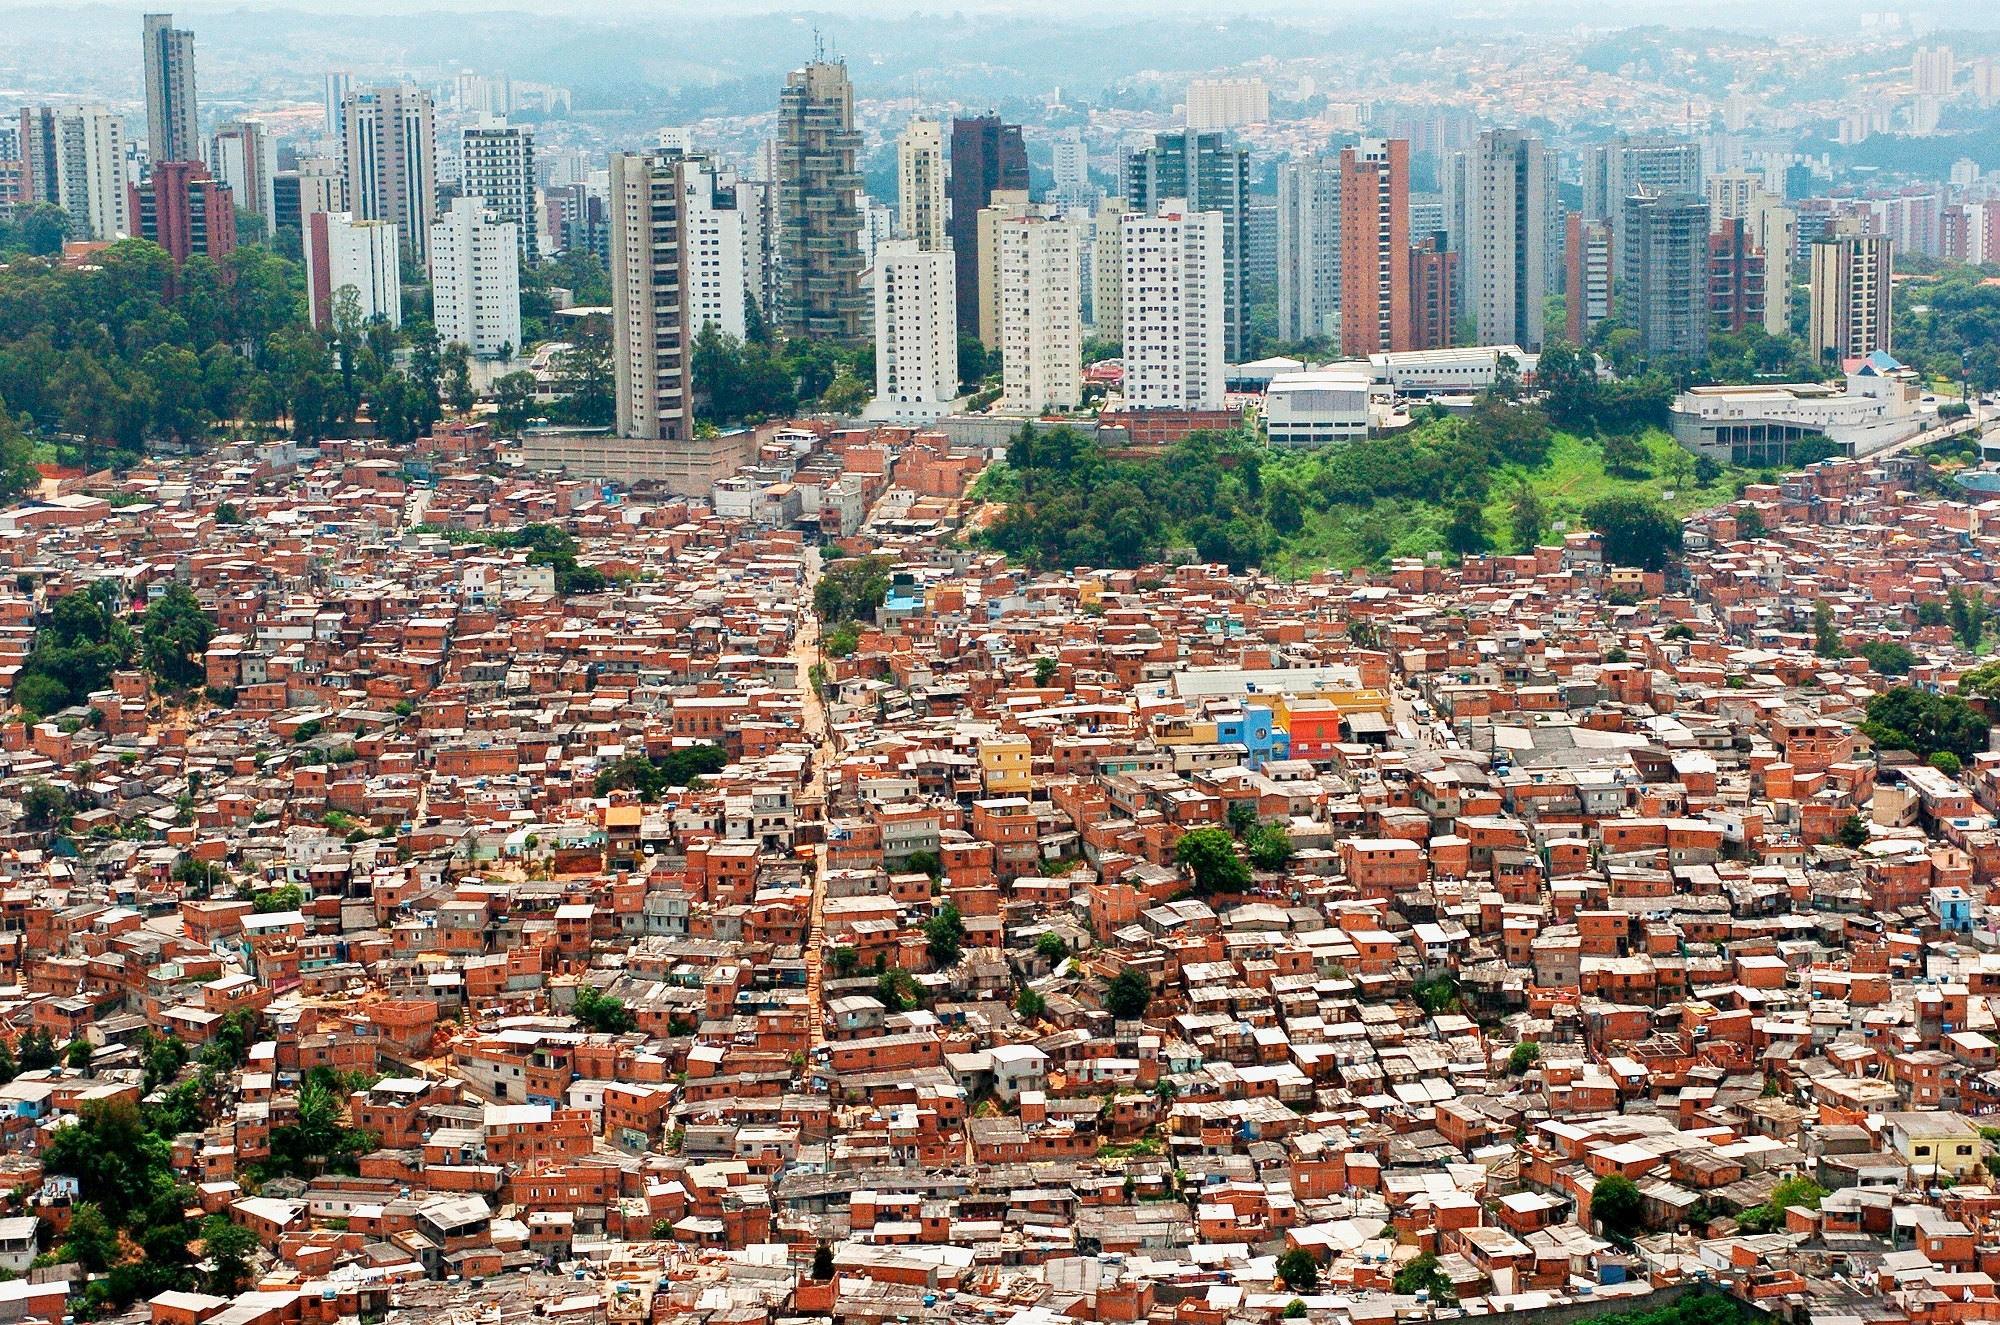 Favela Morumbi Sao Paulo